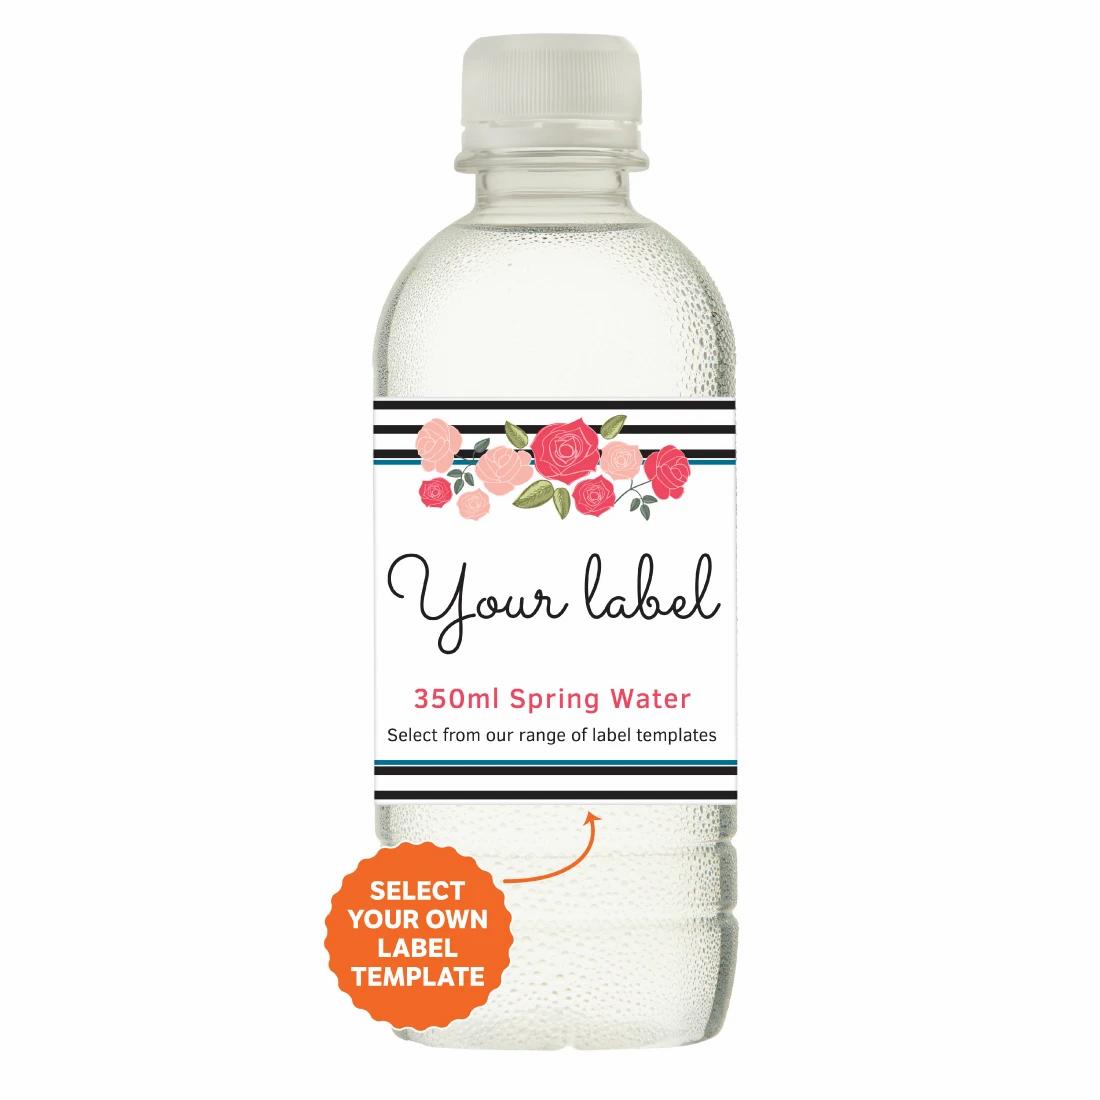 Branded water works!